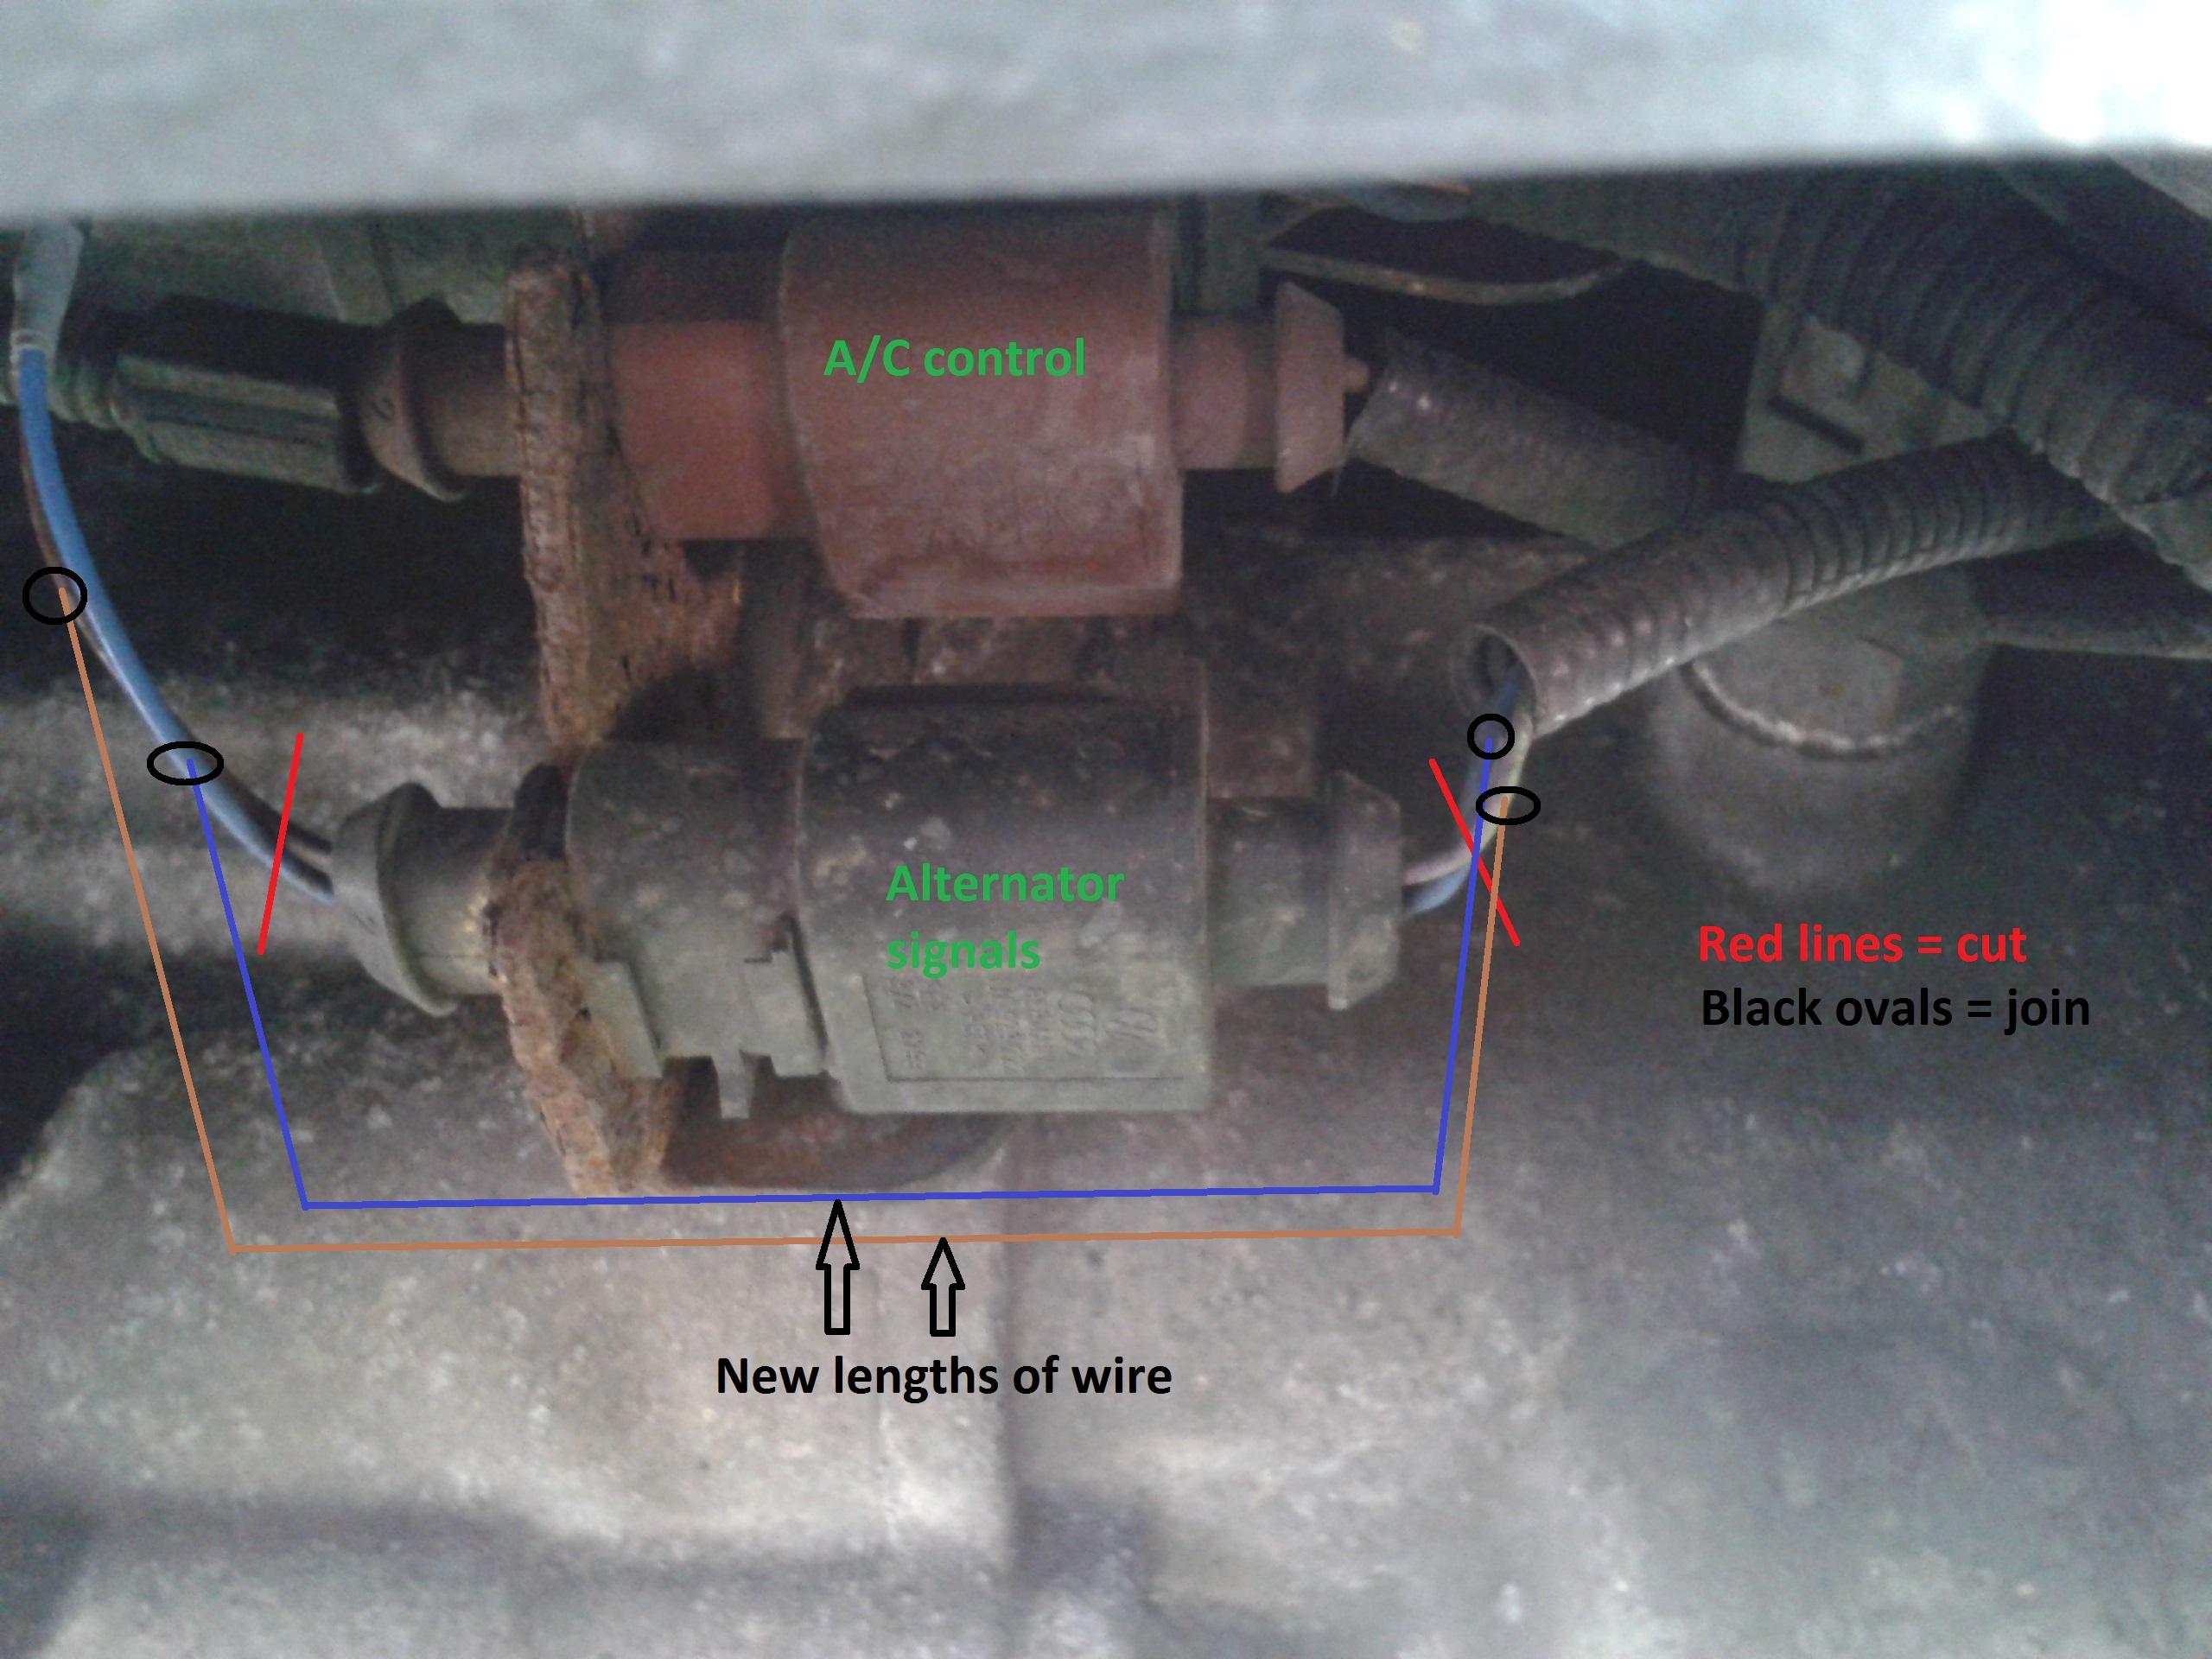 Skoda Fabia Alternator Wiring Diagram Diagrams Engine Analog Amp Meter Chrysler Ford